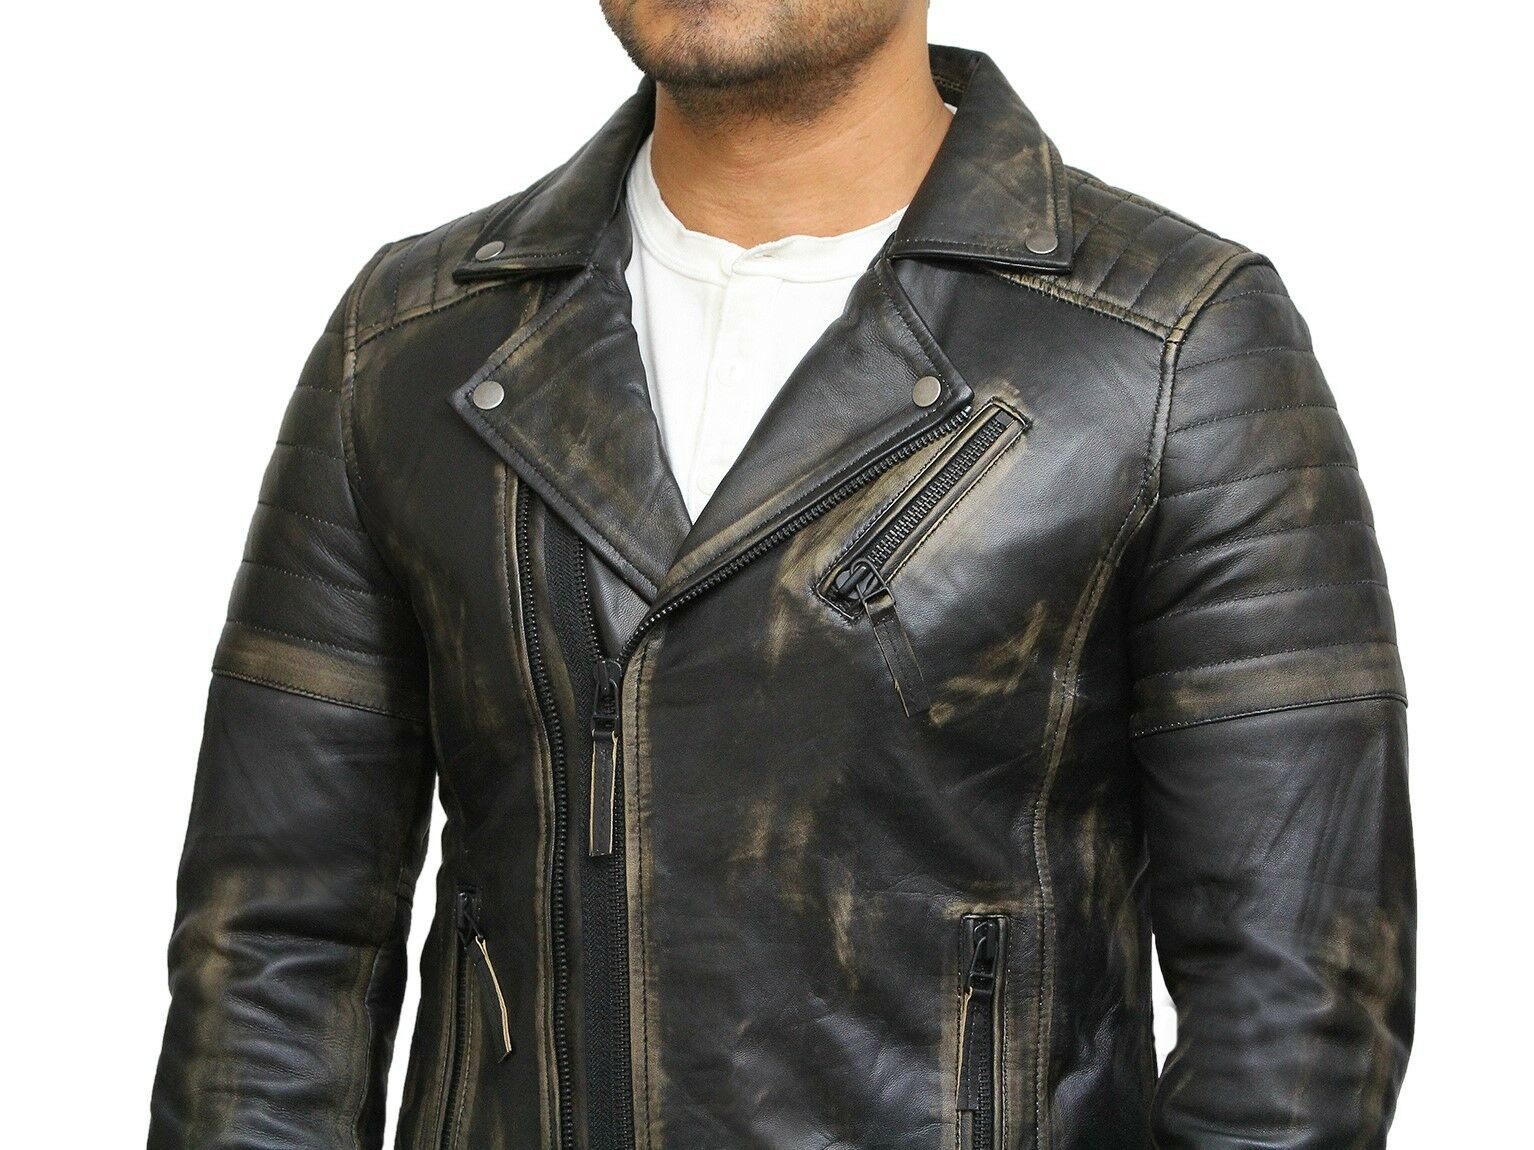 Vestes Mens Motard Vintage Hommes Pour Cuir Brandslock XqOSYIZ